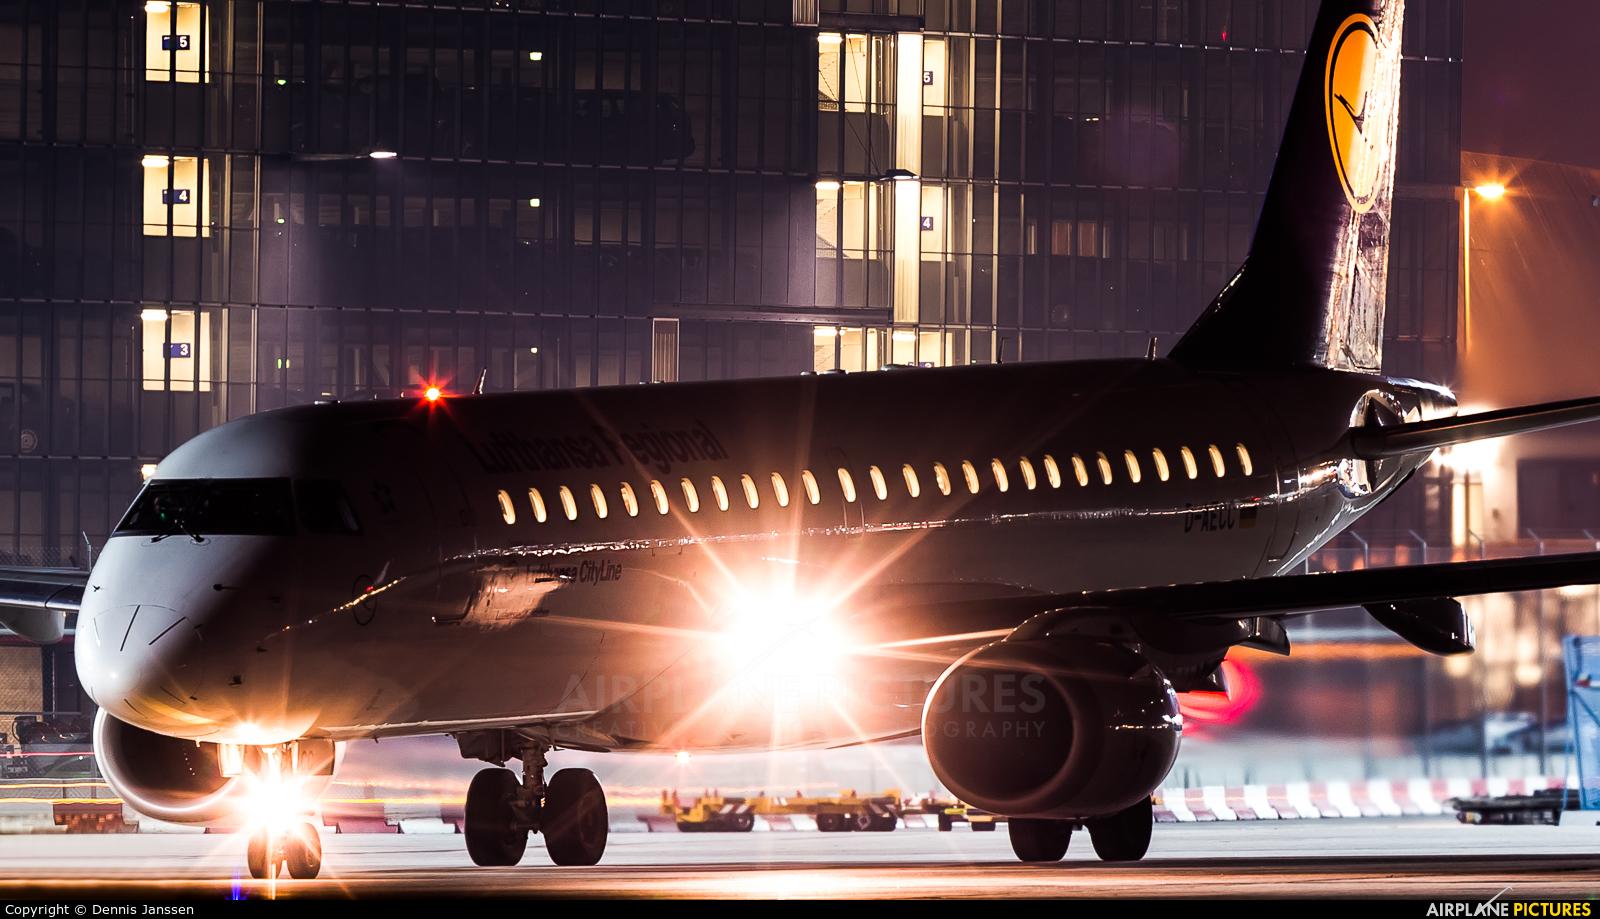 Lufthansa Regional - CityLine D-AECC aircraft at Frankfurt